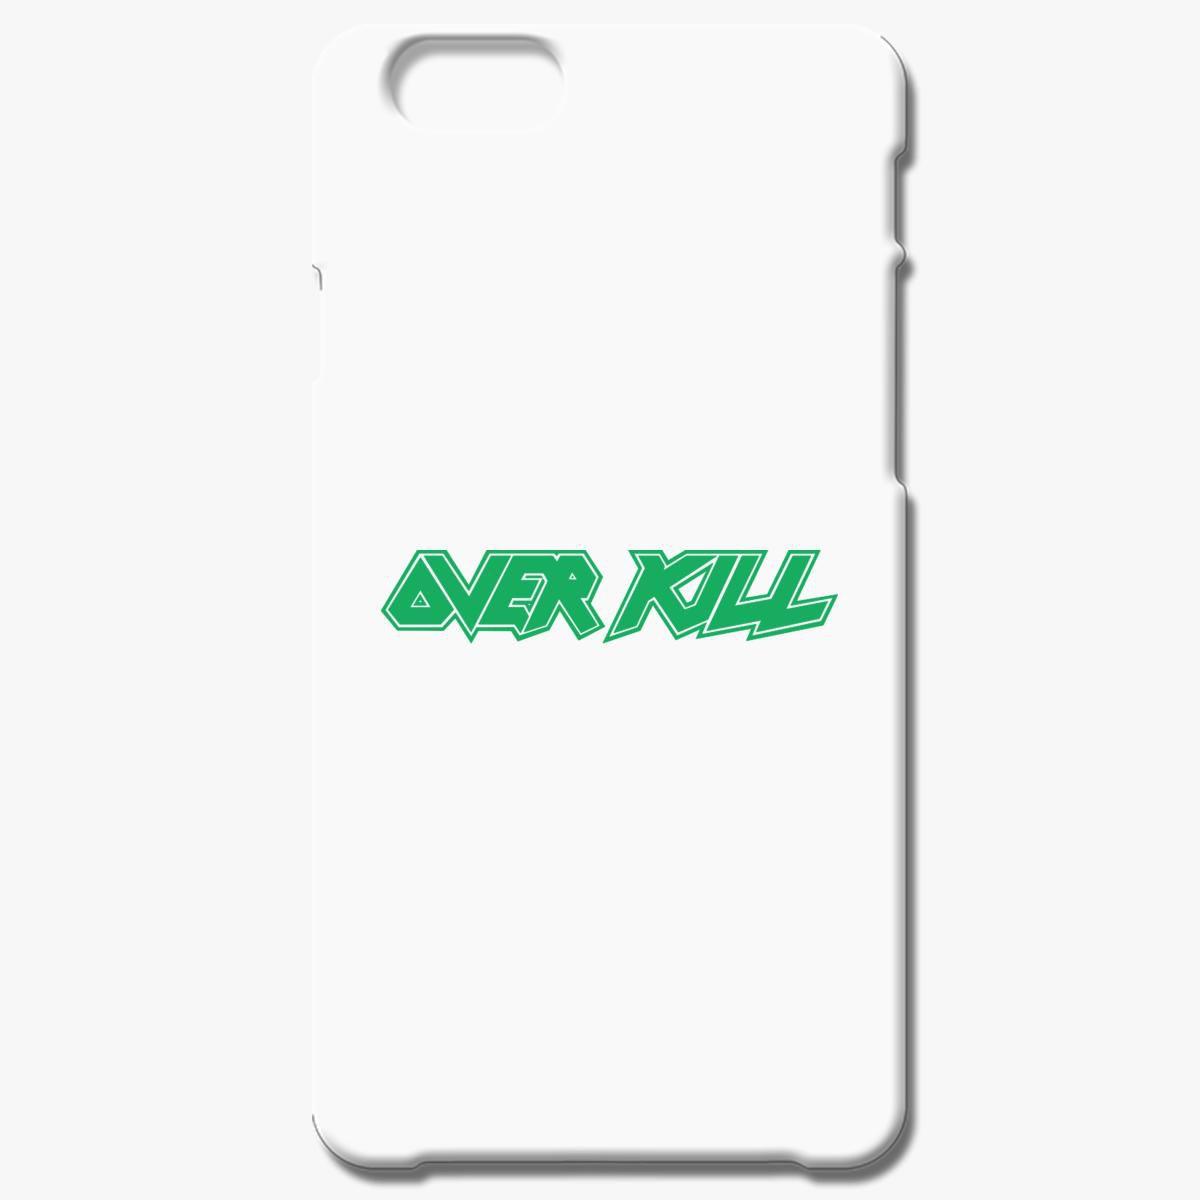 Over Kill Iphone 6 6s Plus Case